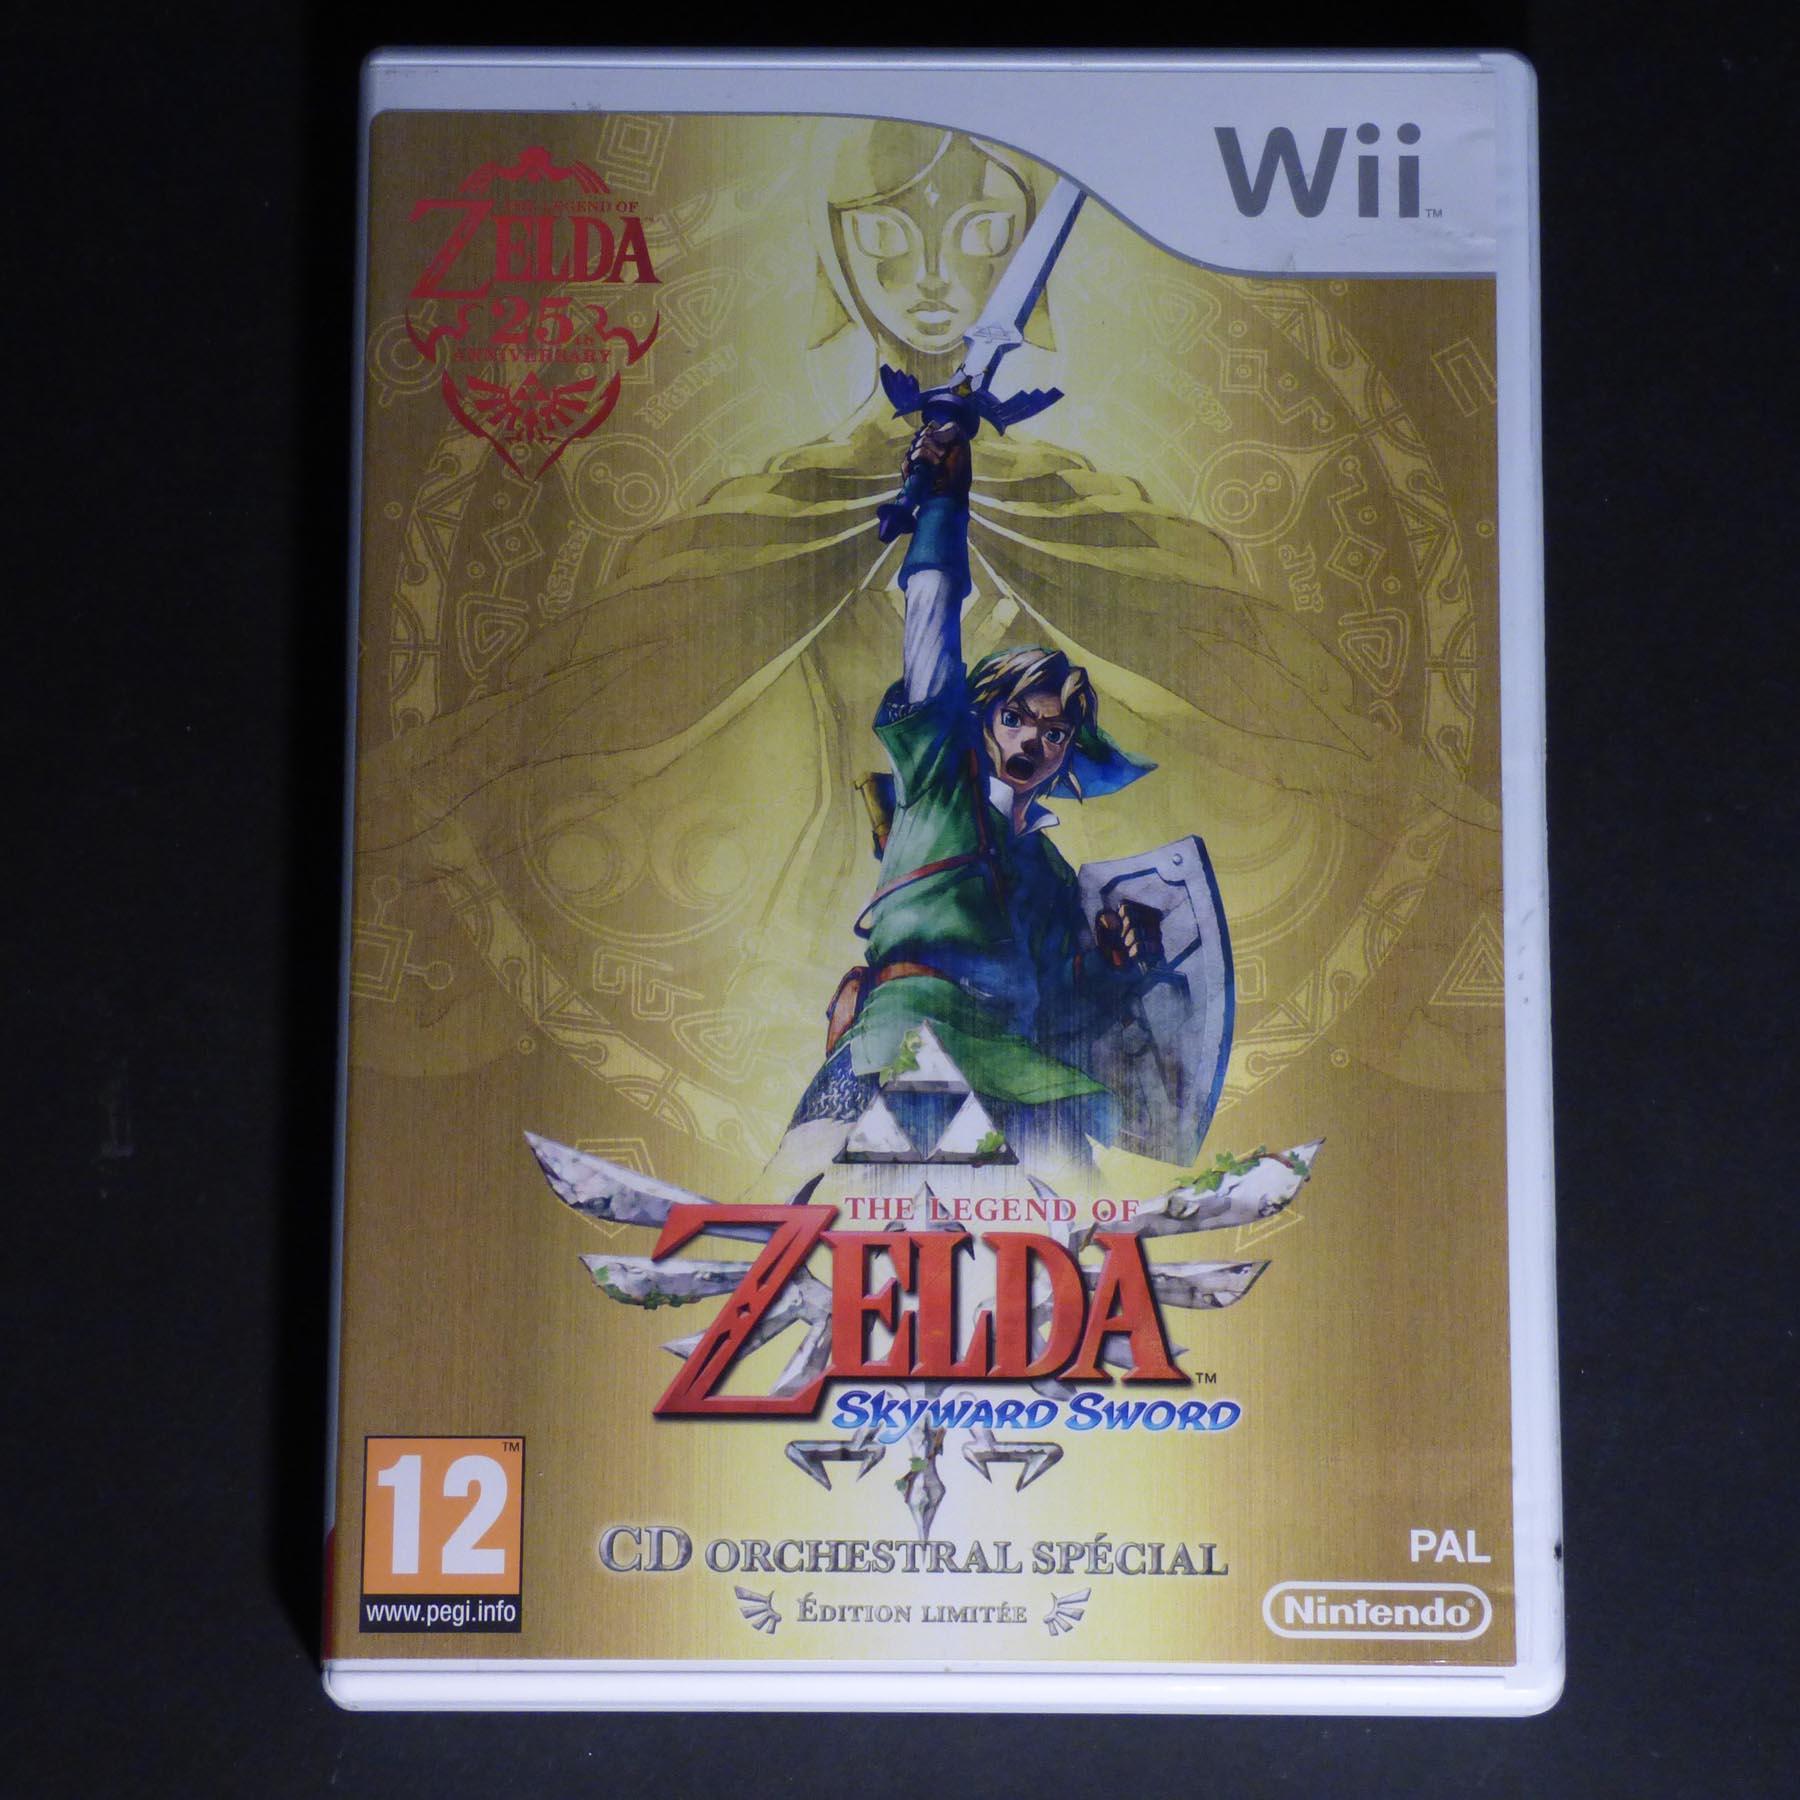 Retro-Game-Zone-%E2%80%93-The-Legend-of-Zelda-Skyward-Sword-Edition-Limit%C3%A9e-%E2%80%93-Bo%C3%AEte.jpg